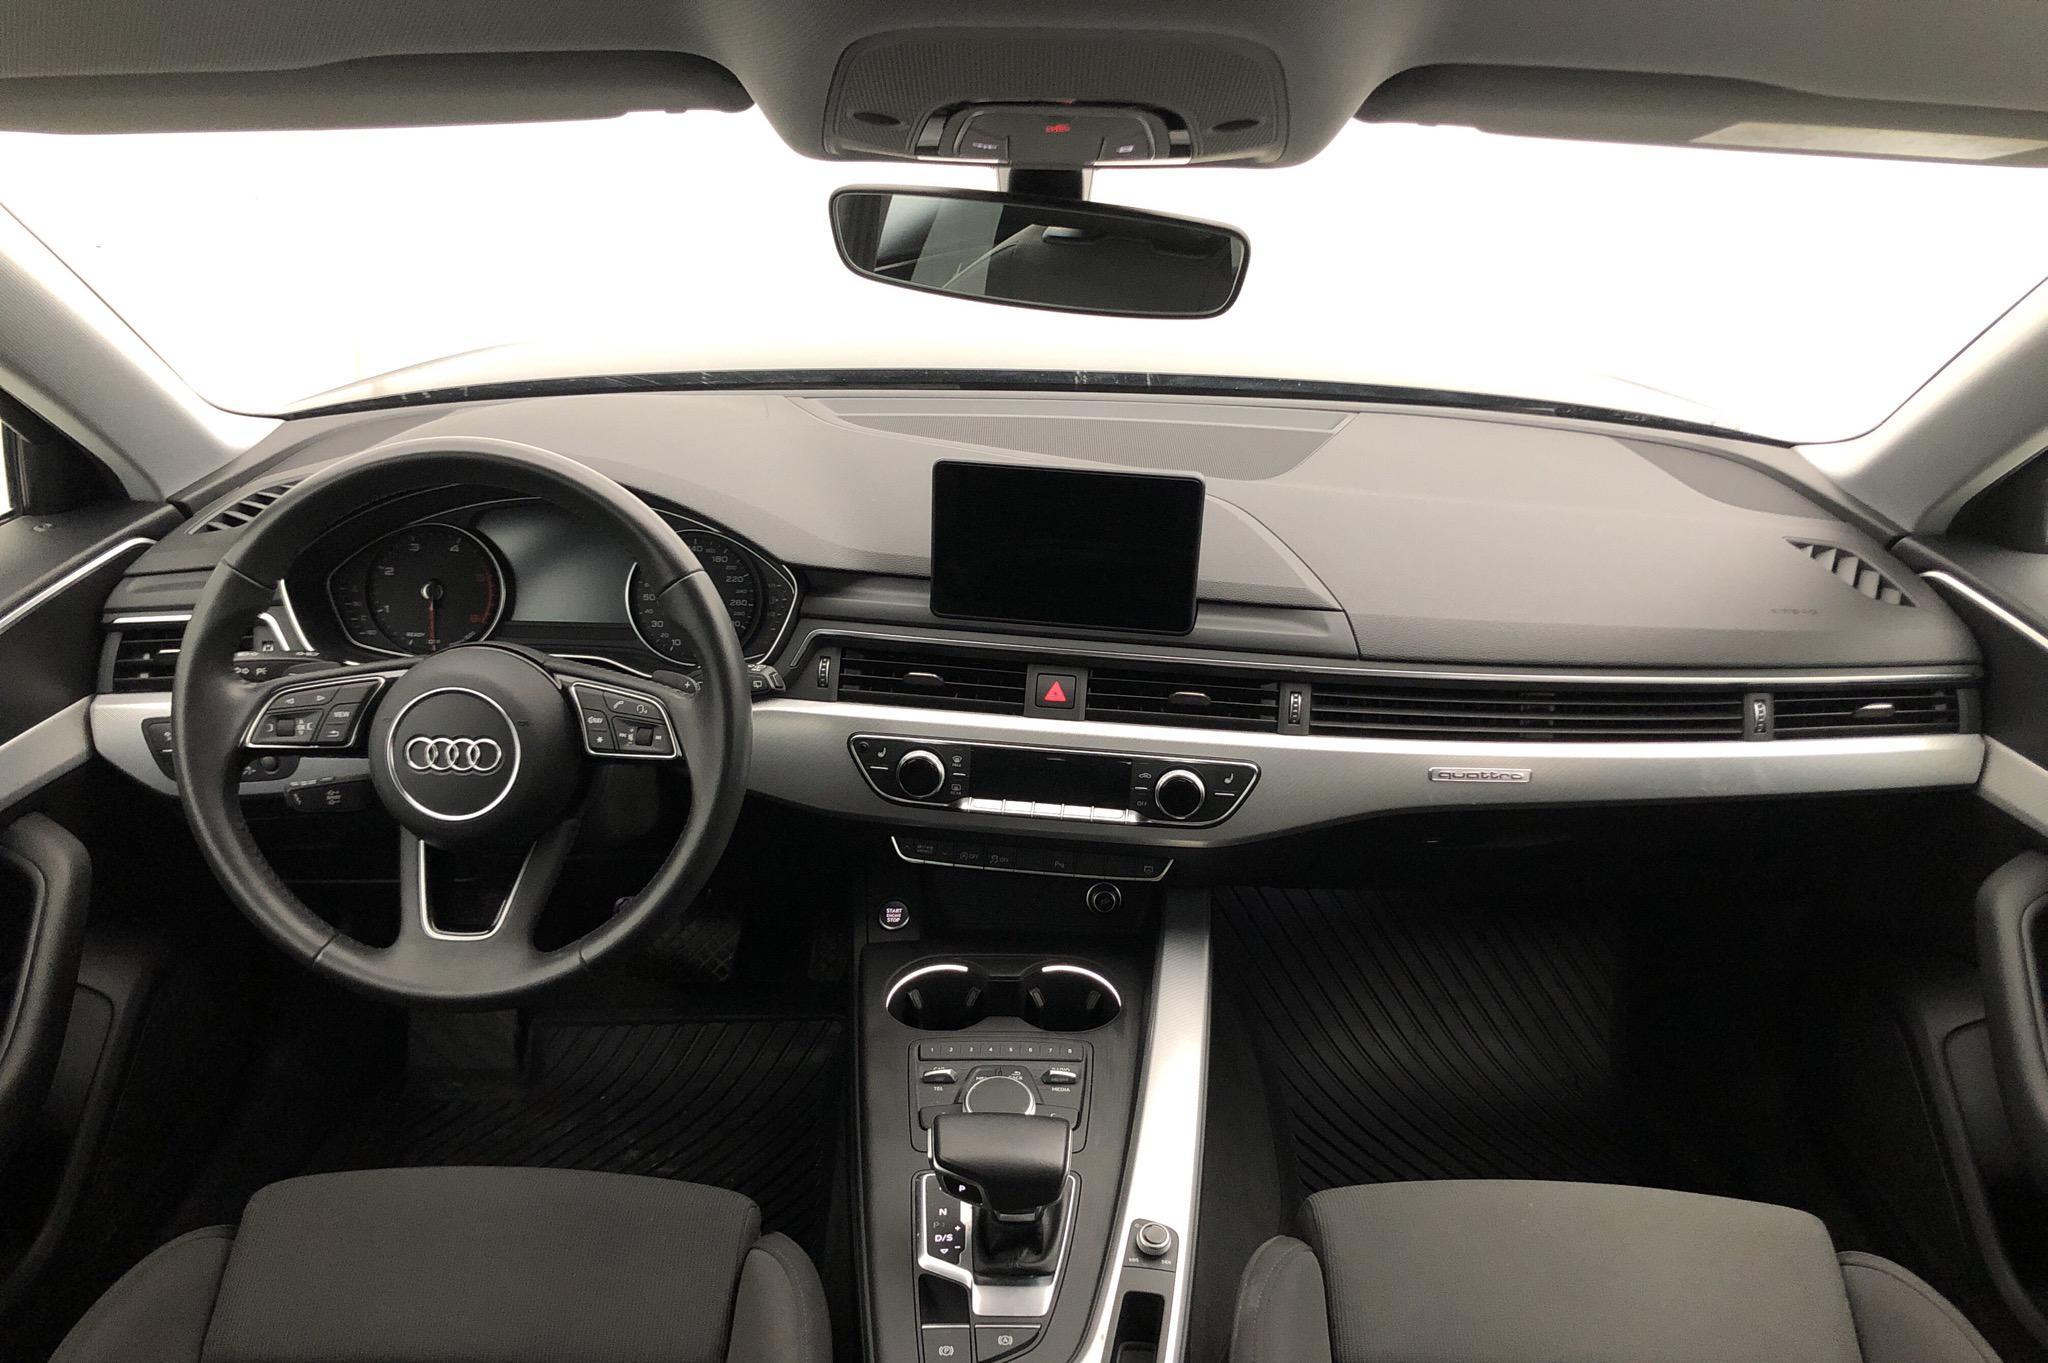 Audi A4 2.0 TDI Avant quattro (190hk) - 61 590 km - Automatic - black - 2017